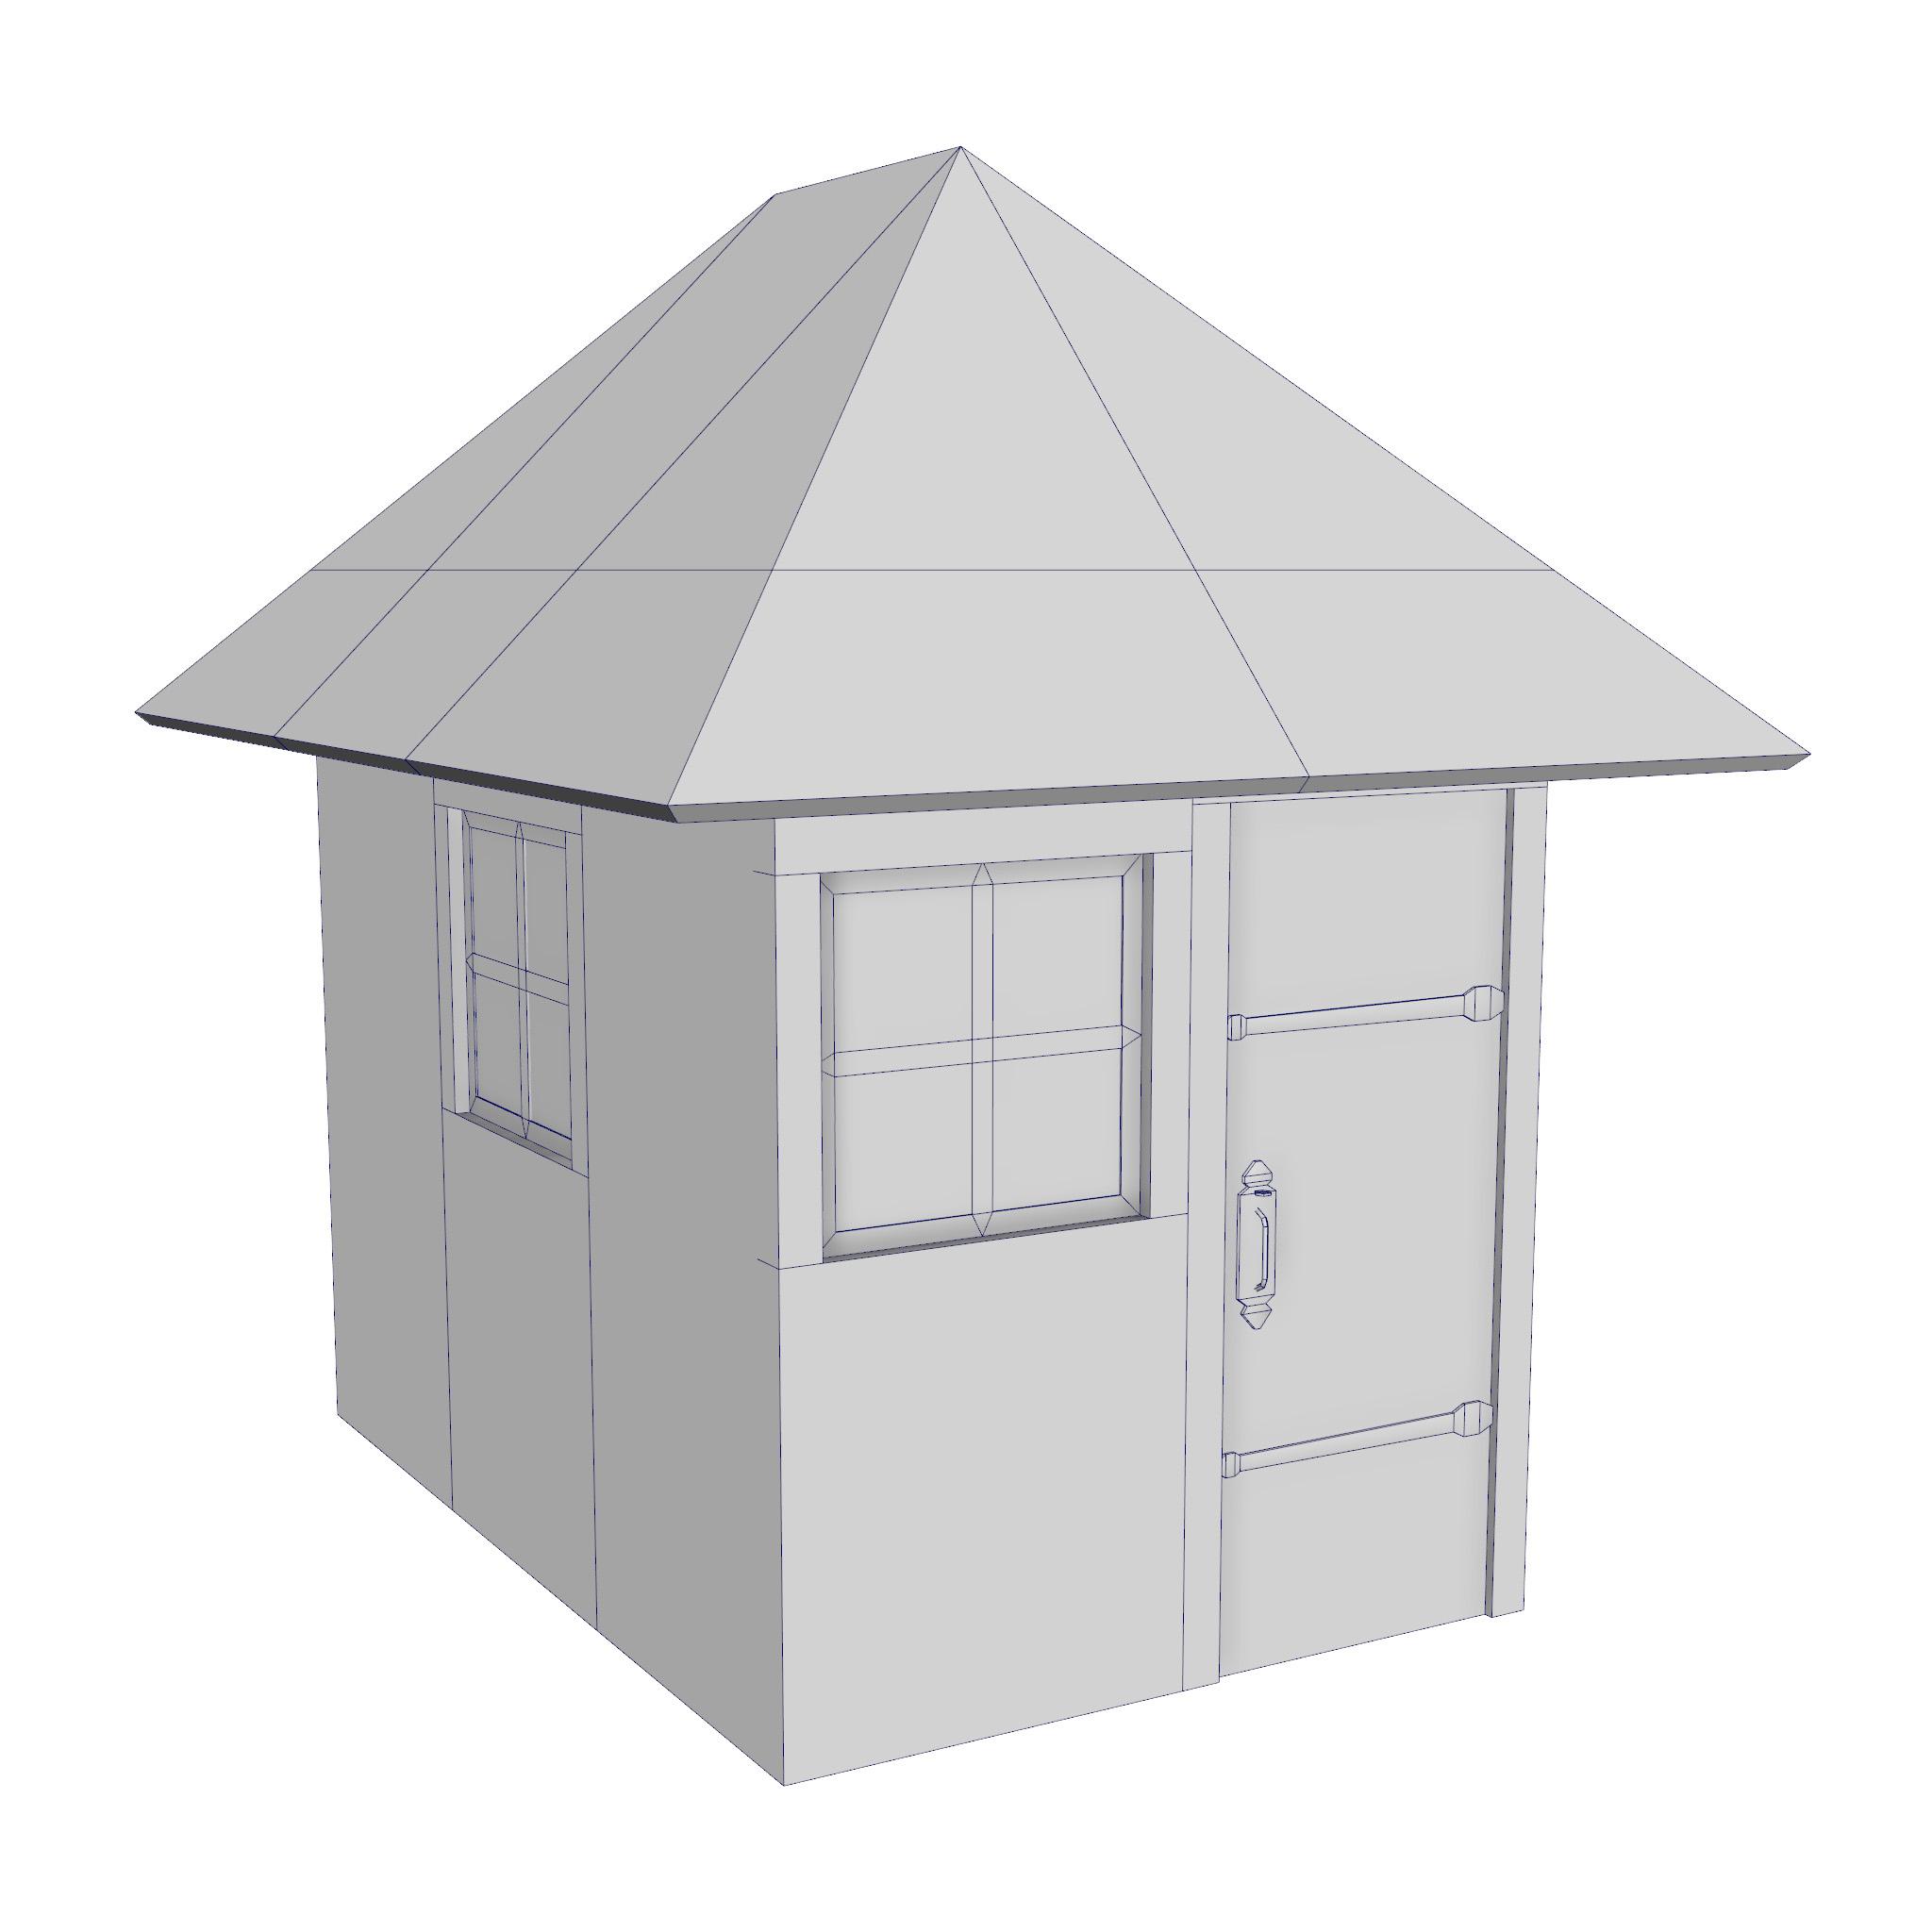 modular brick house set 3d model fbx ma mb 271415